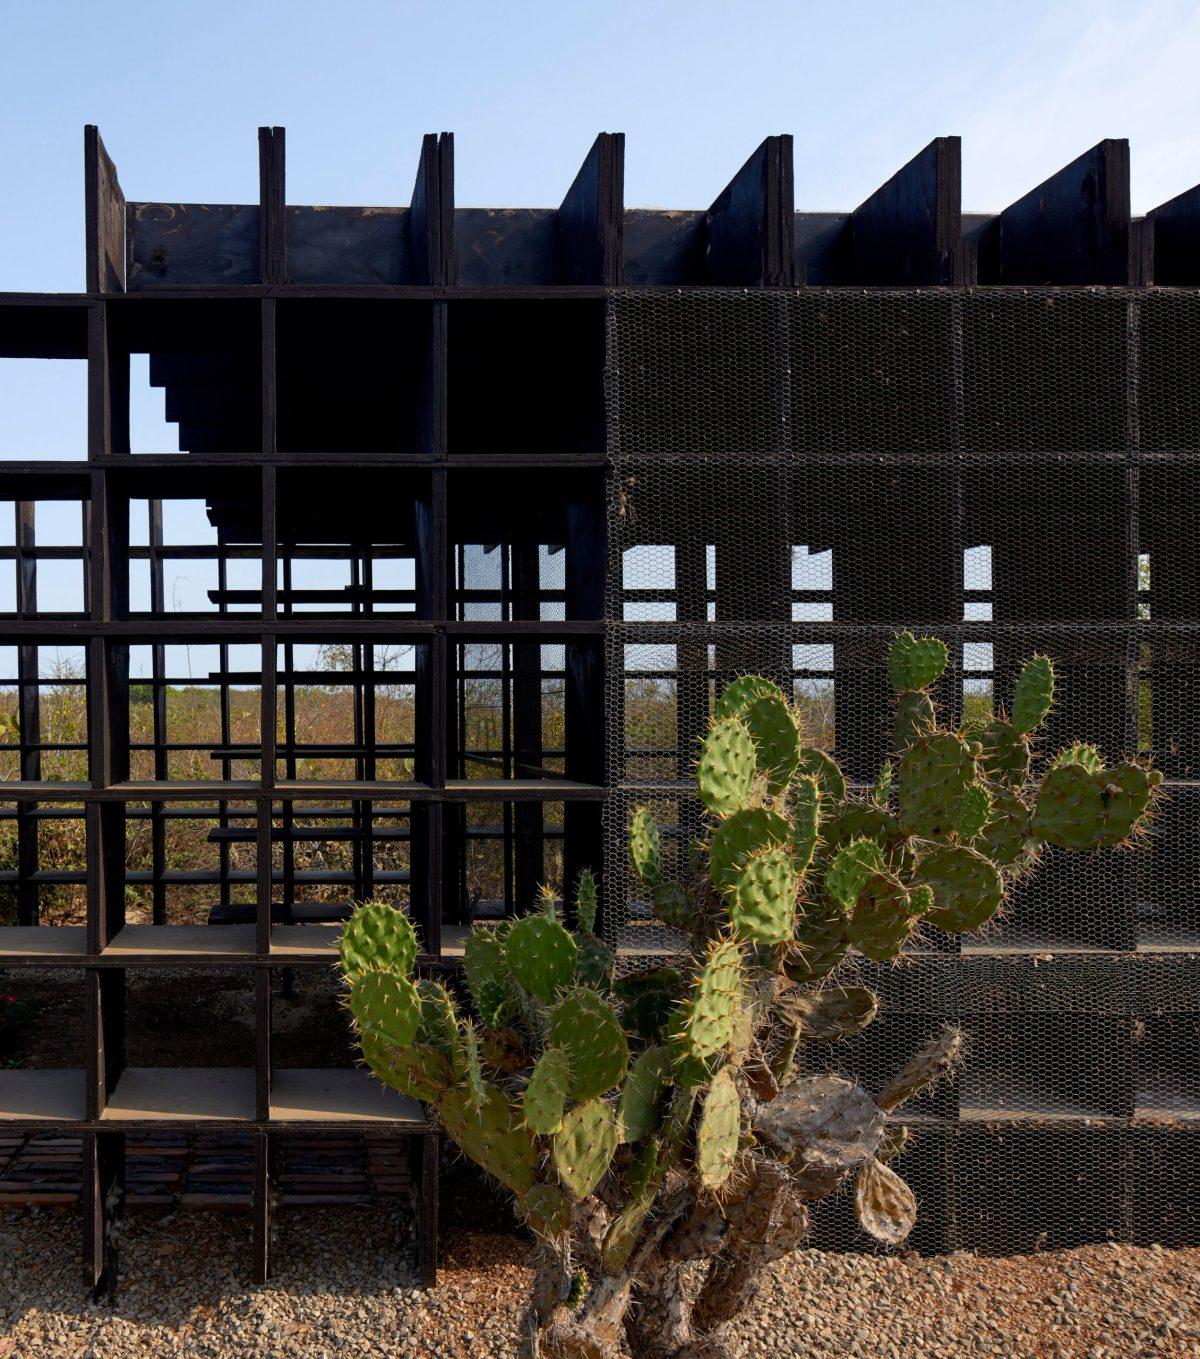 casa-wabi-coop-kengo-kuma-architecture-mexico-3